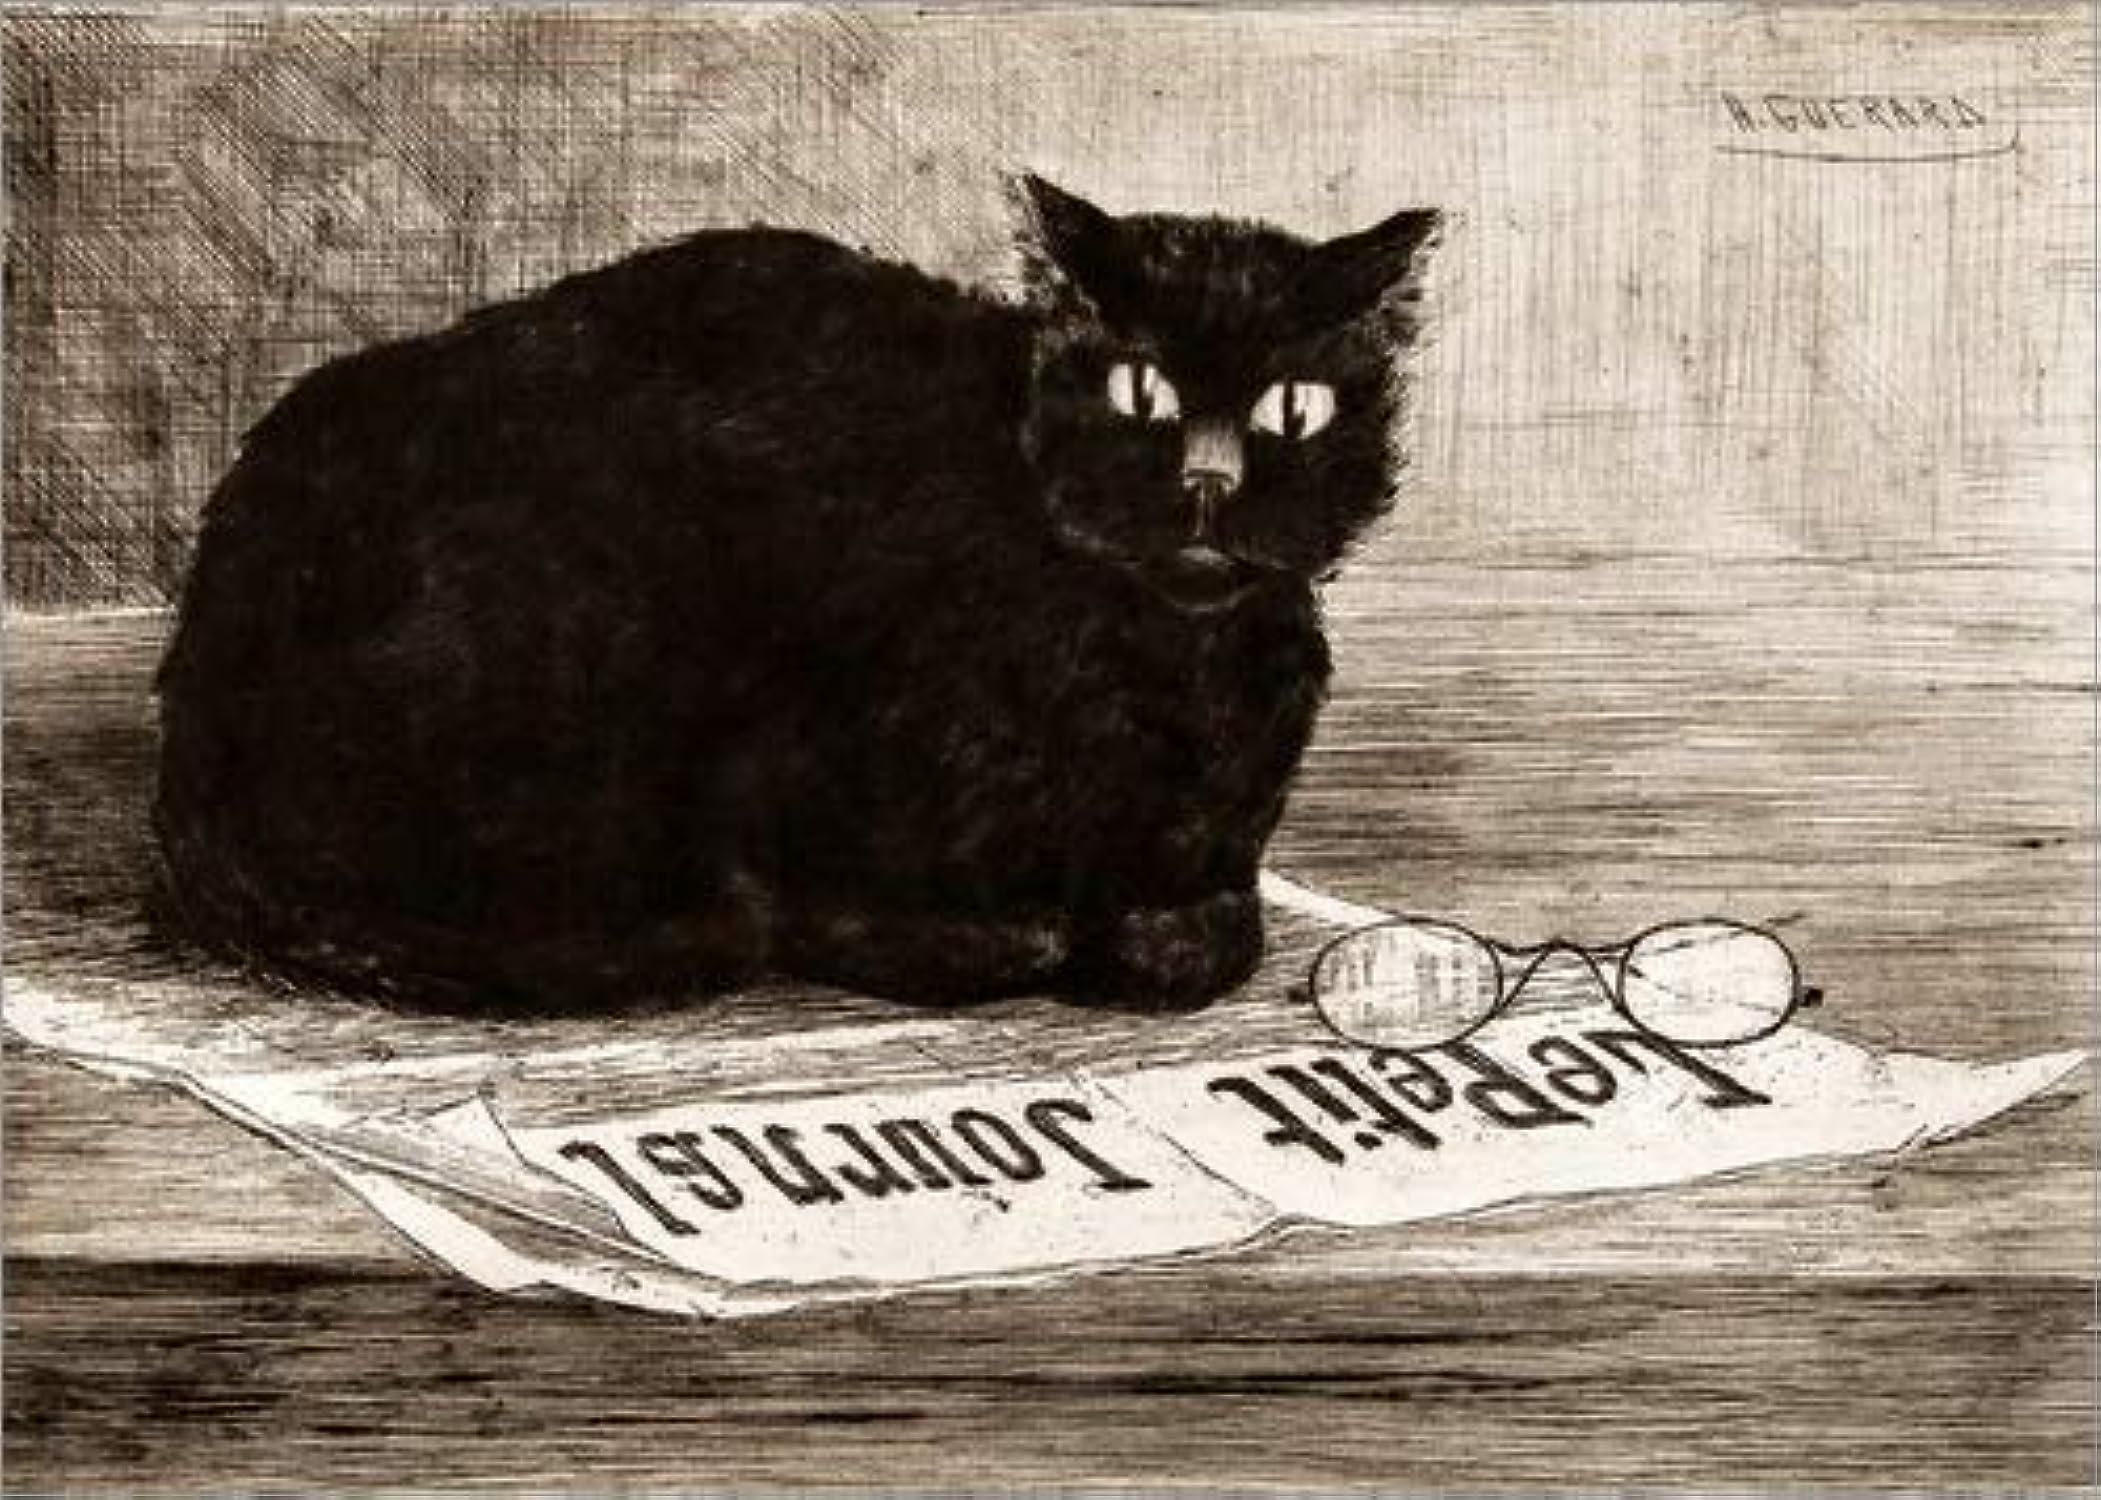 Posterlounge Lienzo 80 x 60 cm  Chat negro Sur un Journal de Henri-Charles Guerard - Cuadro Terminado, Cuadro sobre Bastidor, lámina terminada sobre Lienzo auténtico, impresión en Lienzo